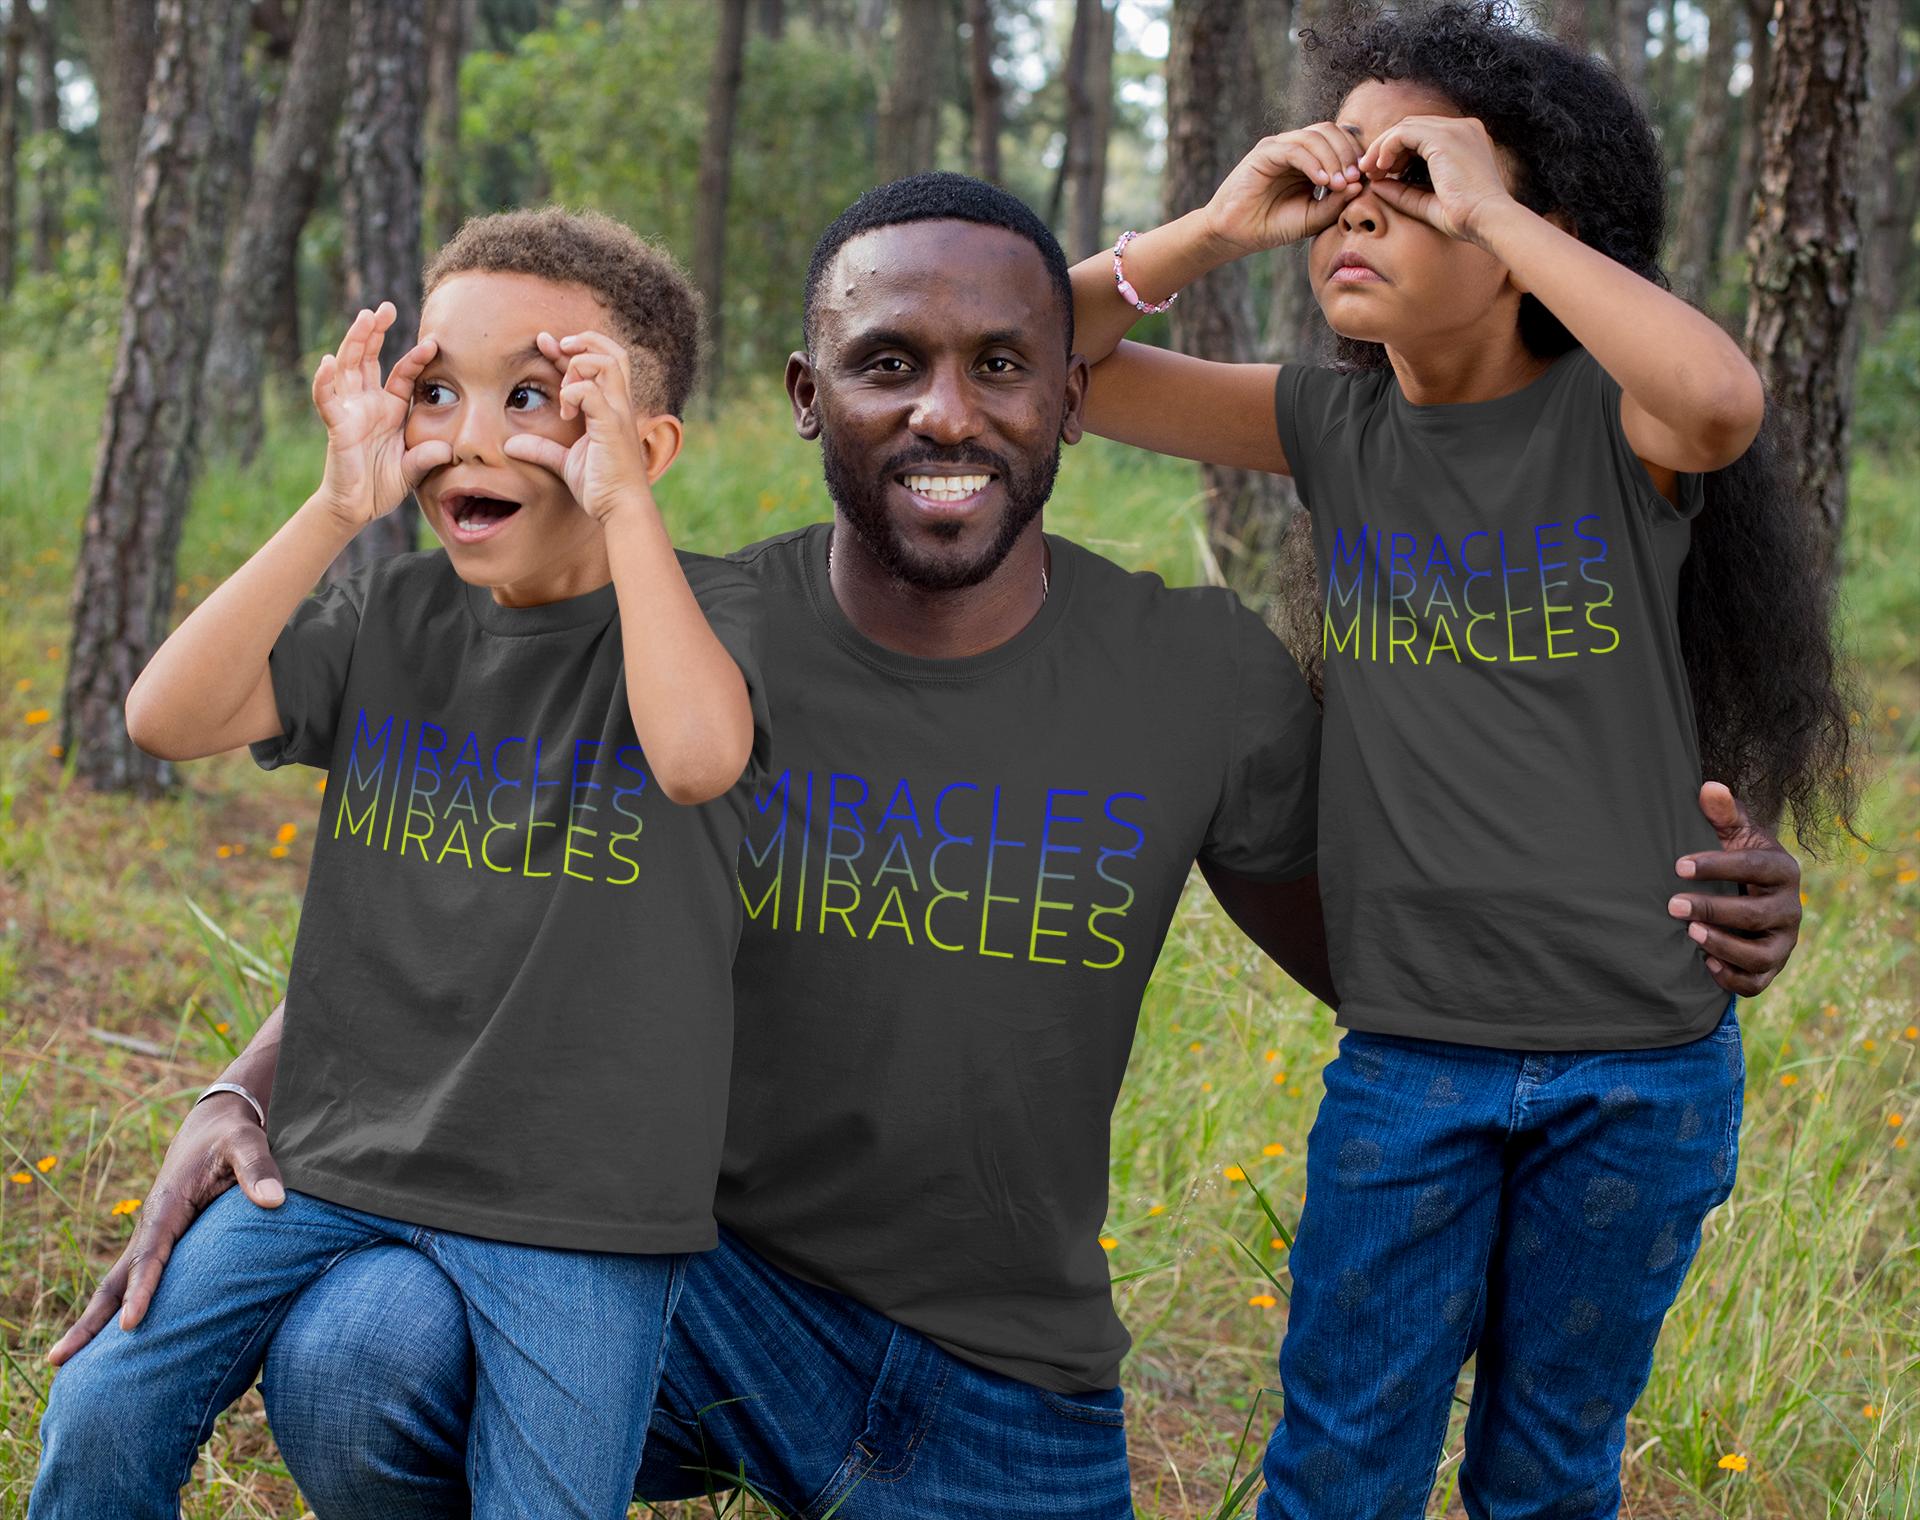 RFM team Miracles t-shirt - Presale